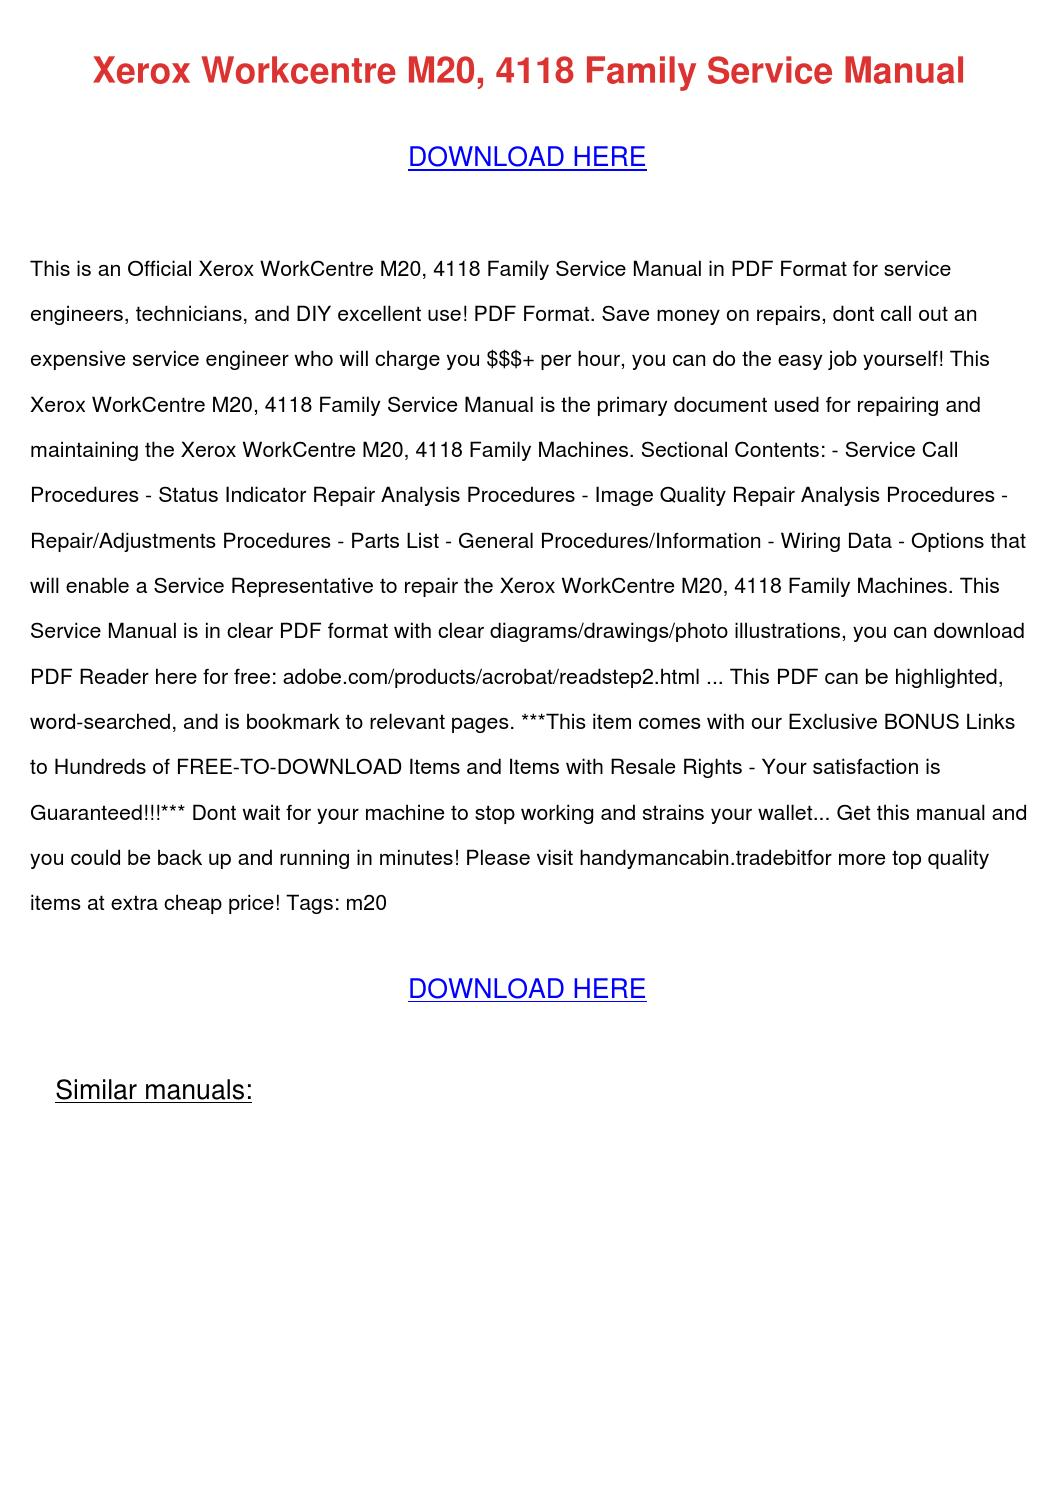 Xerox Workcentre M20 4118 Family Service Manu By Maymcvay border=